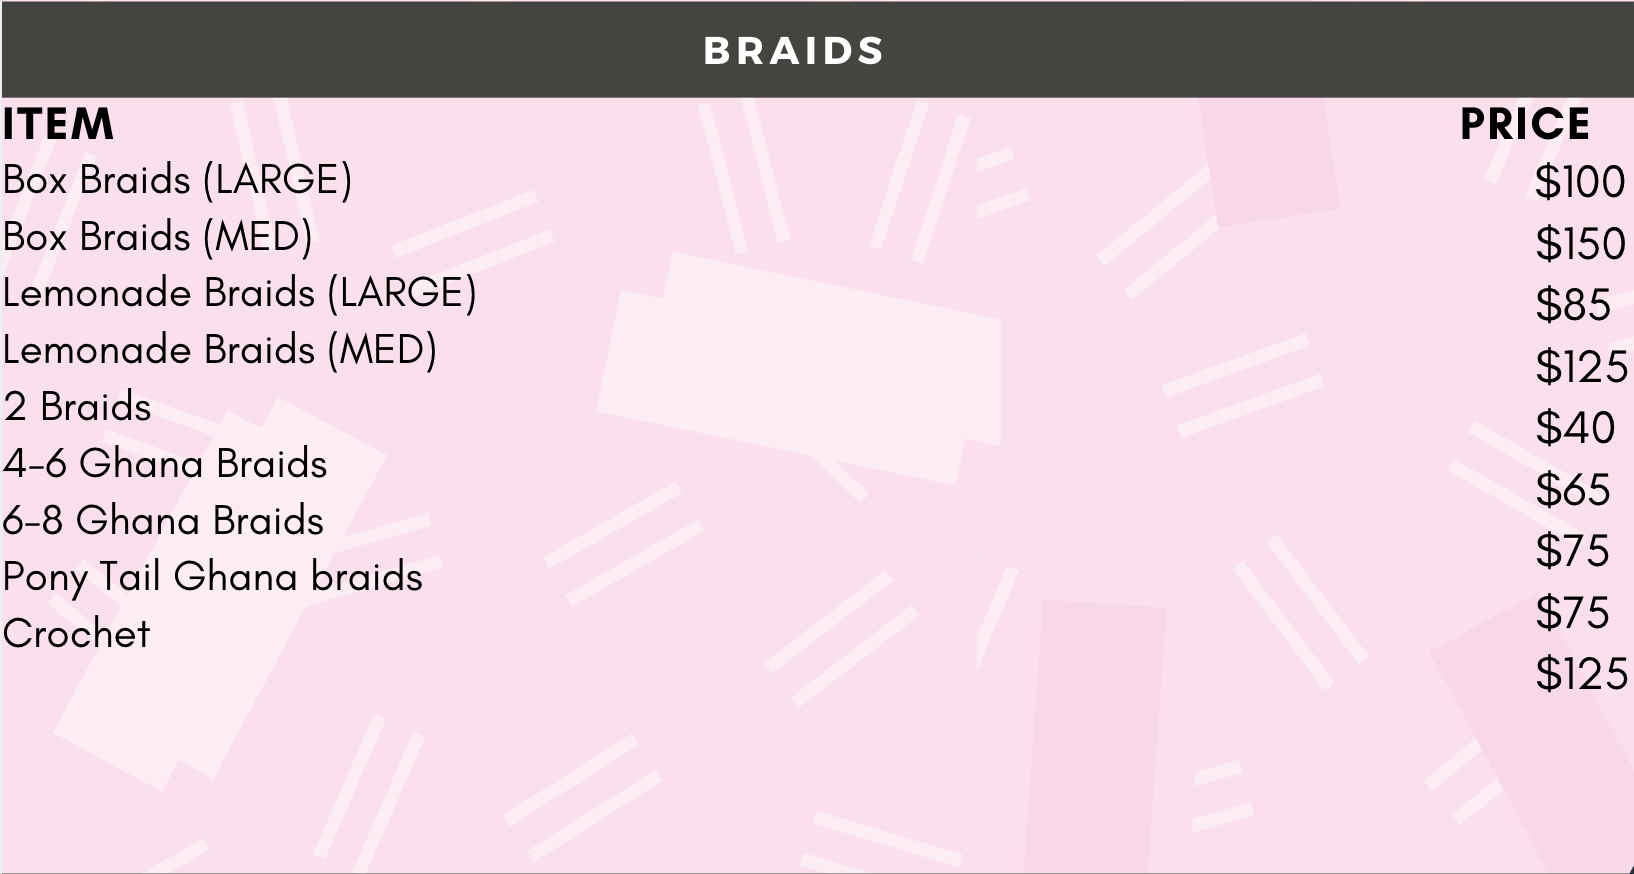 Braids In Fort Lauderdale Sew In Fort Lauderdale Black Hair Salons Box Braids Prices Hair Salon Business